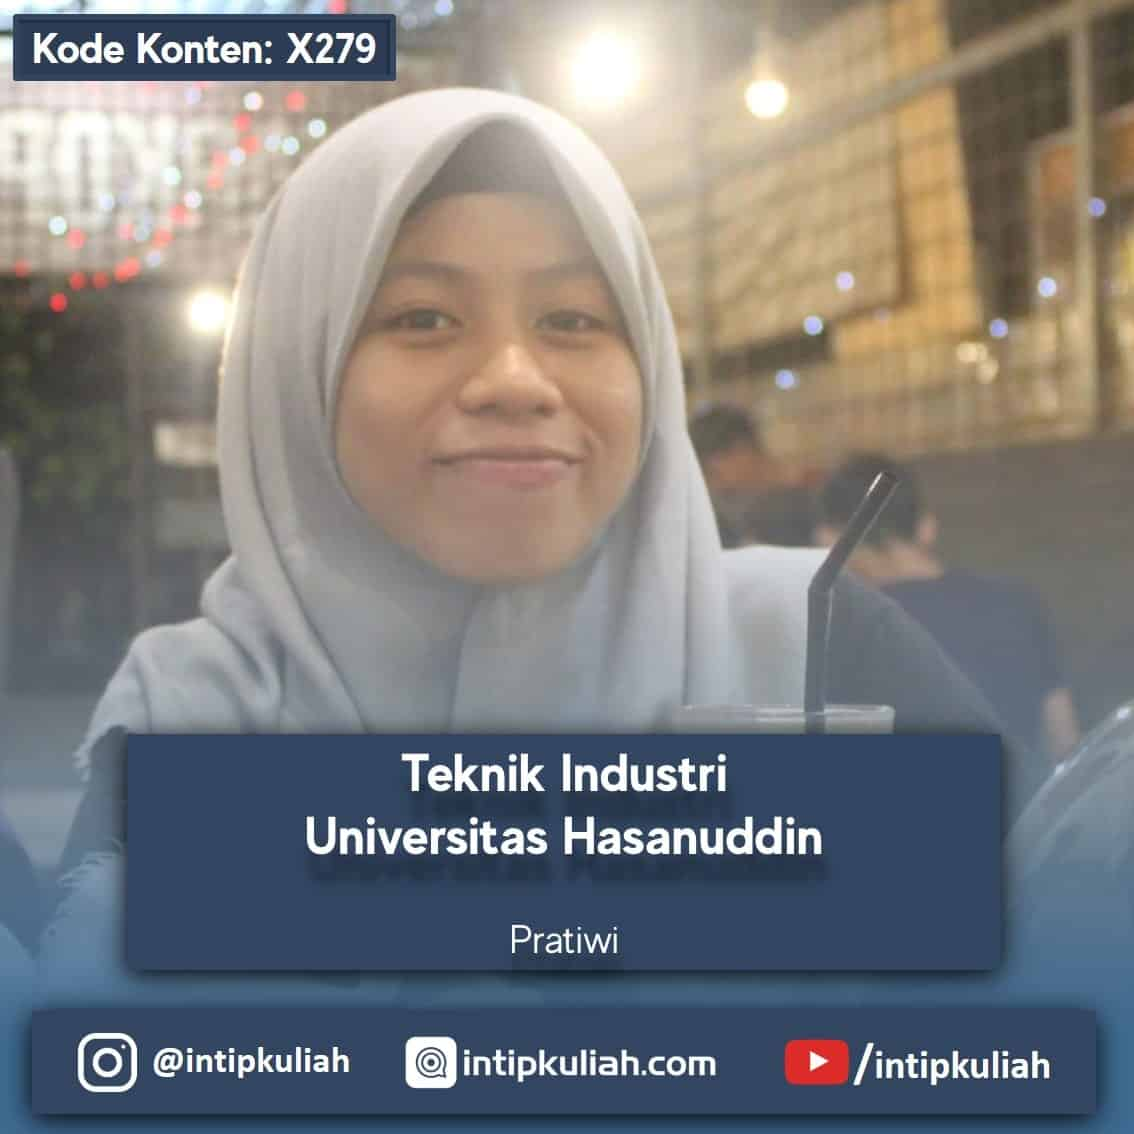 Teknik Industri Universitas Hasanuddin (Tiwi)